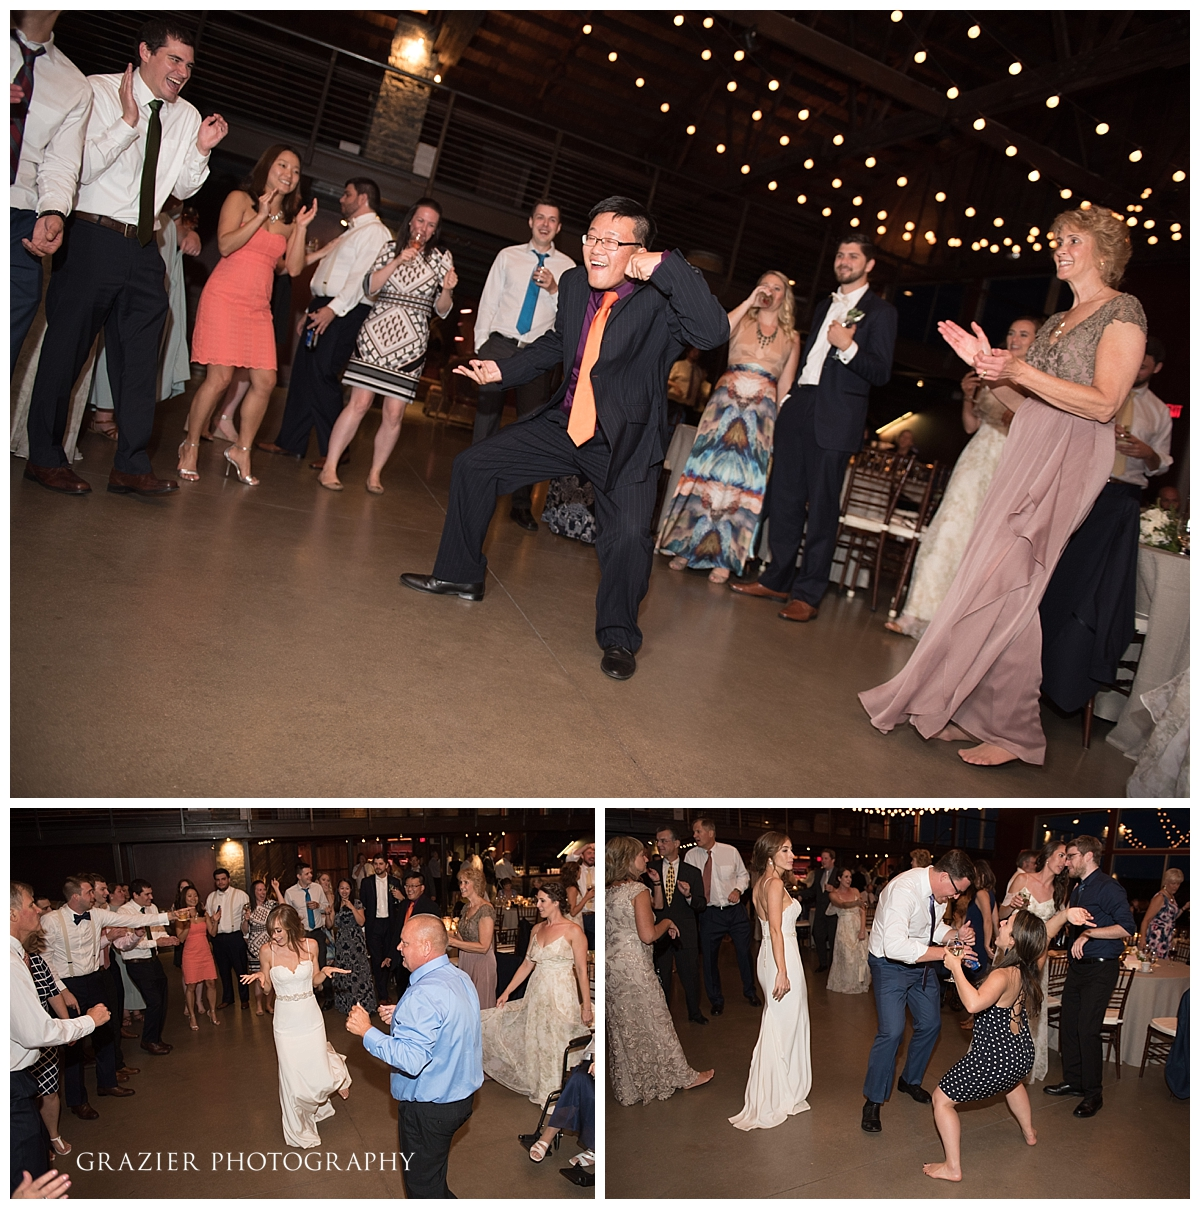 Saltwater Farm Vineyard Wedding Grazier Photography 170825-95_WEB.jpg